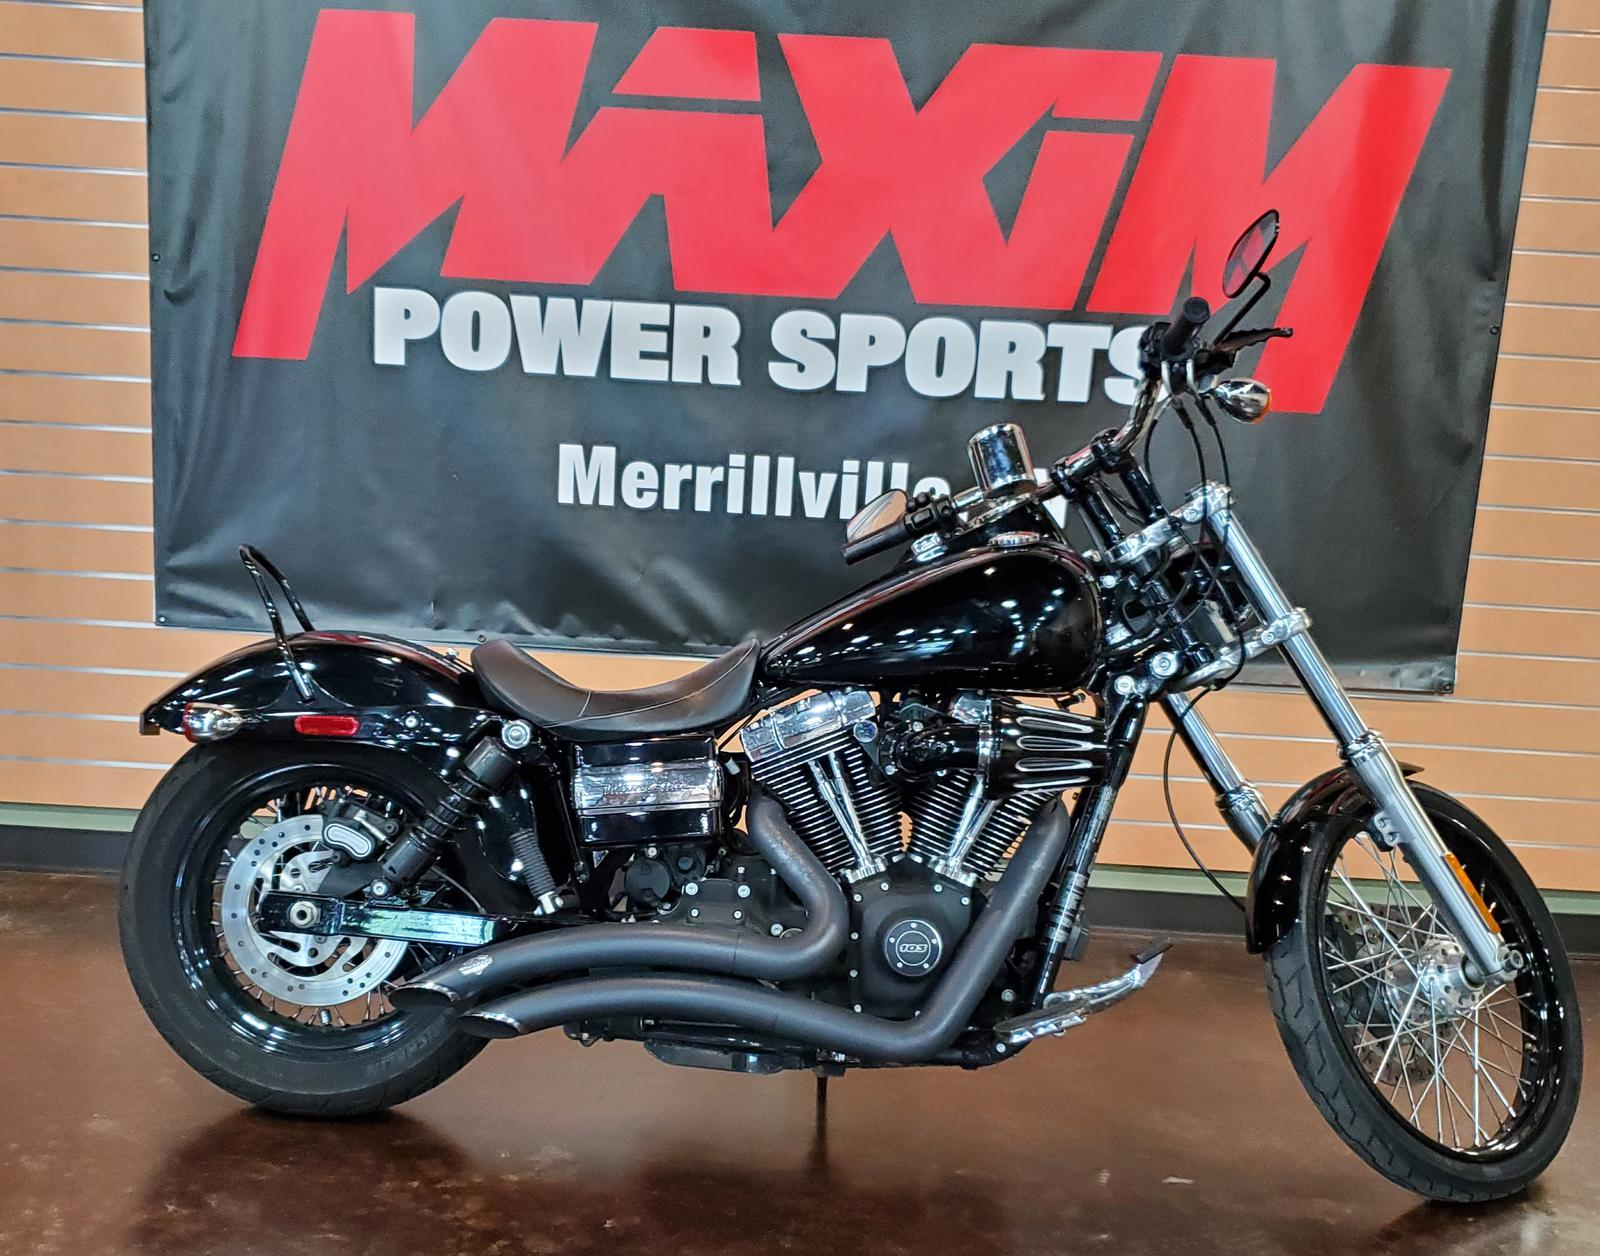 2012 Harley Davidson Dyna Glide Wide Glide For Sale In Merrillville In Maxim Power Sports Merrillville In 219 942 0548